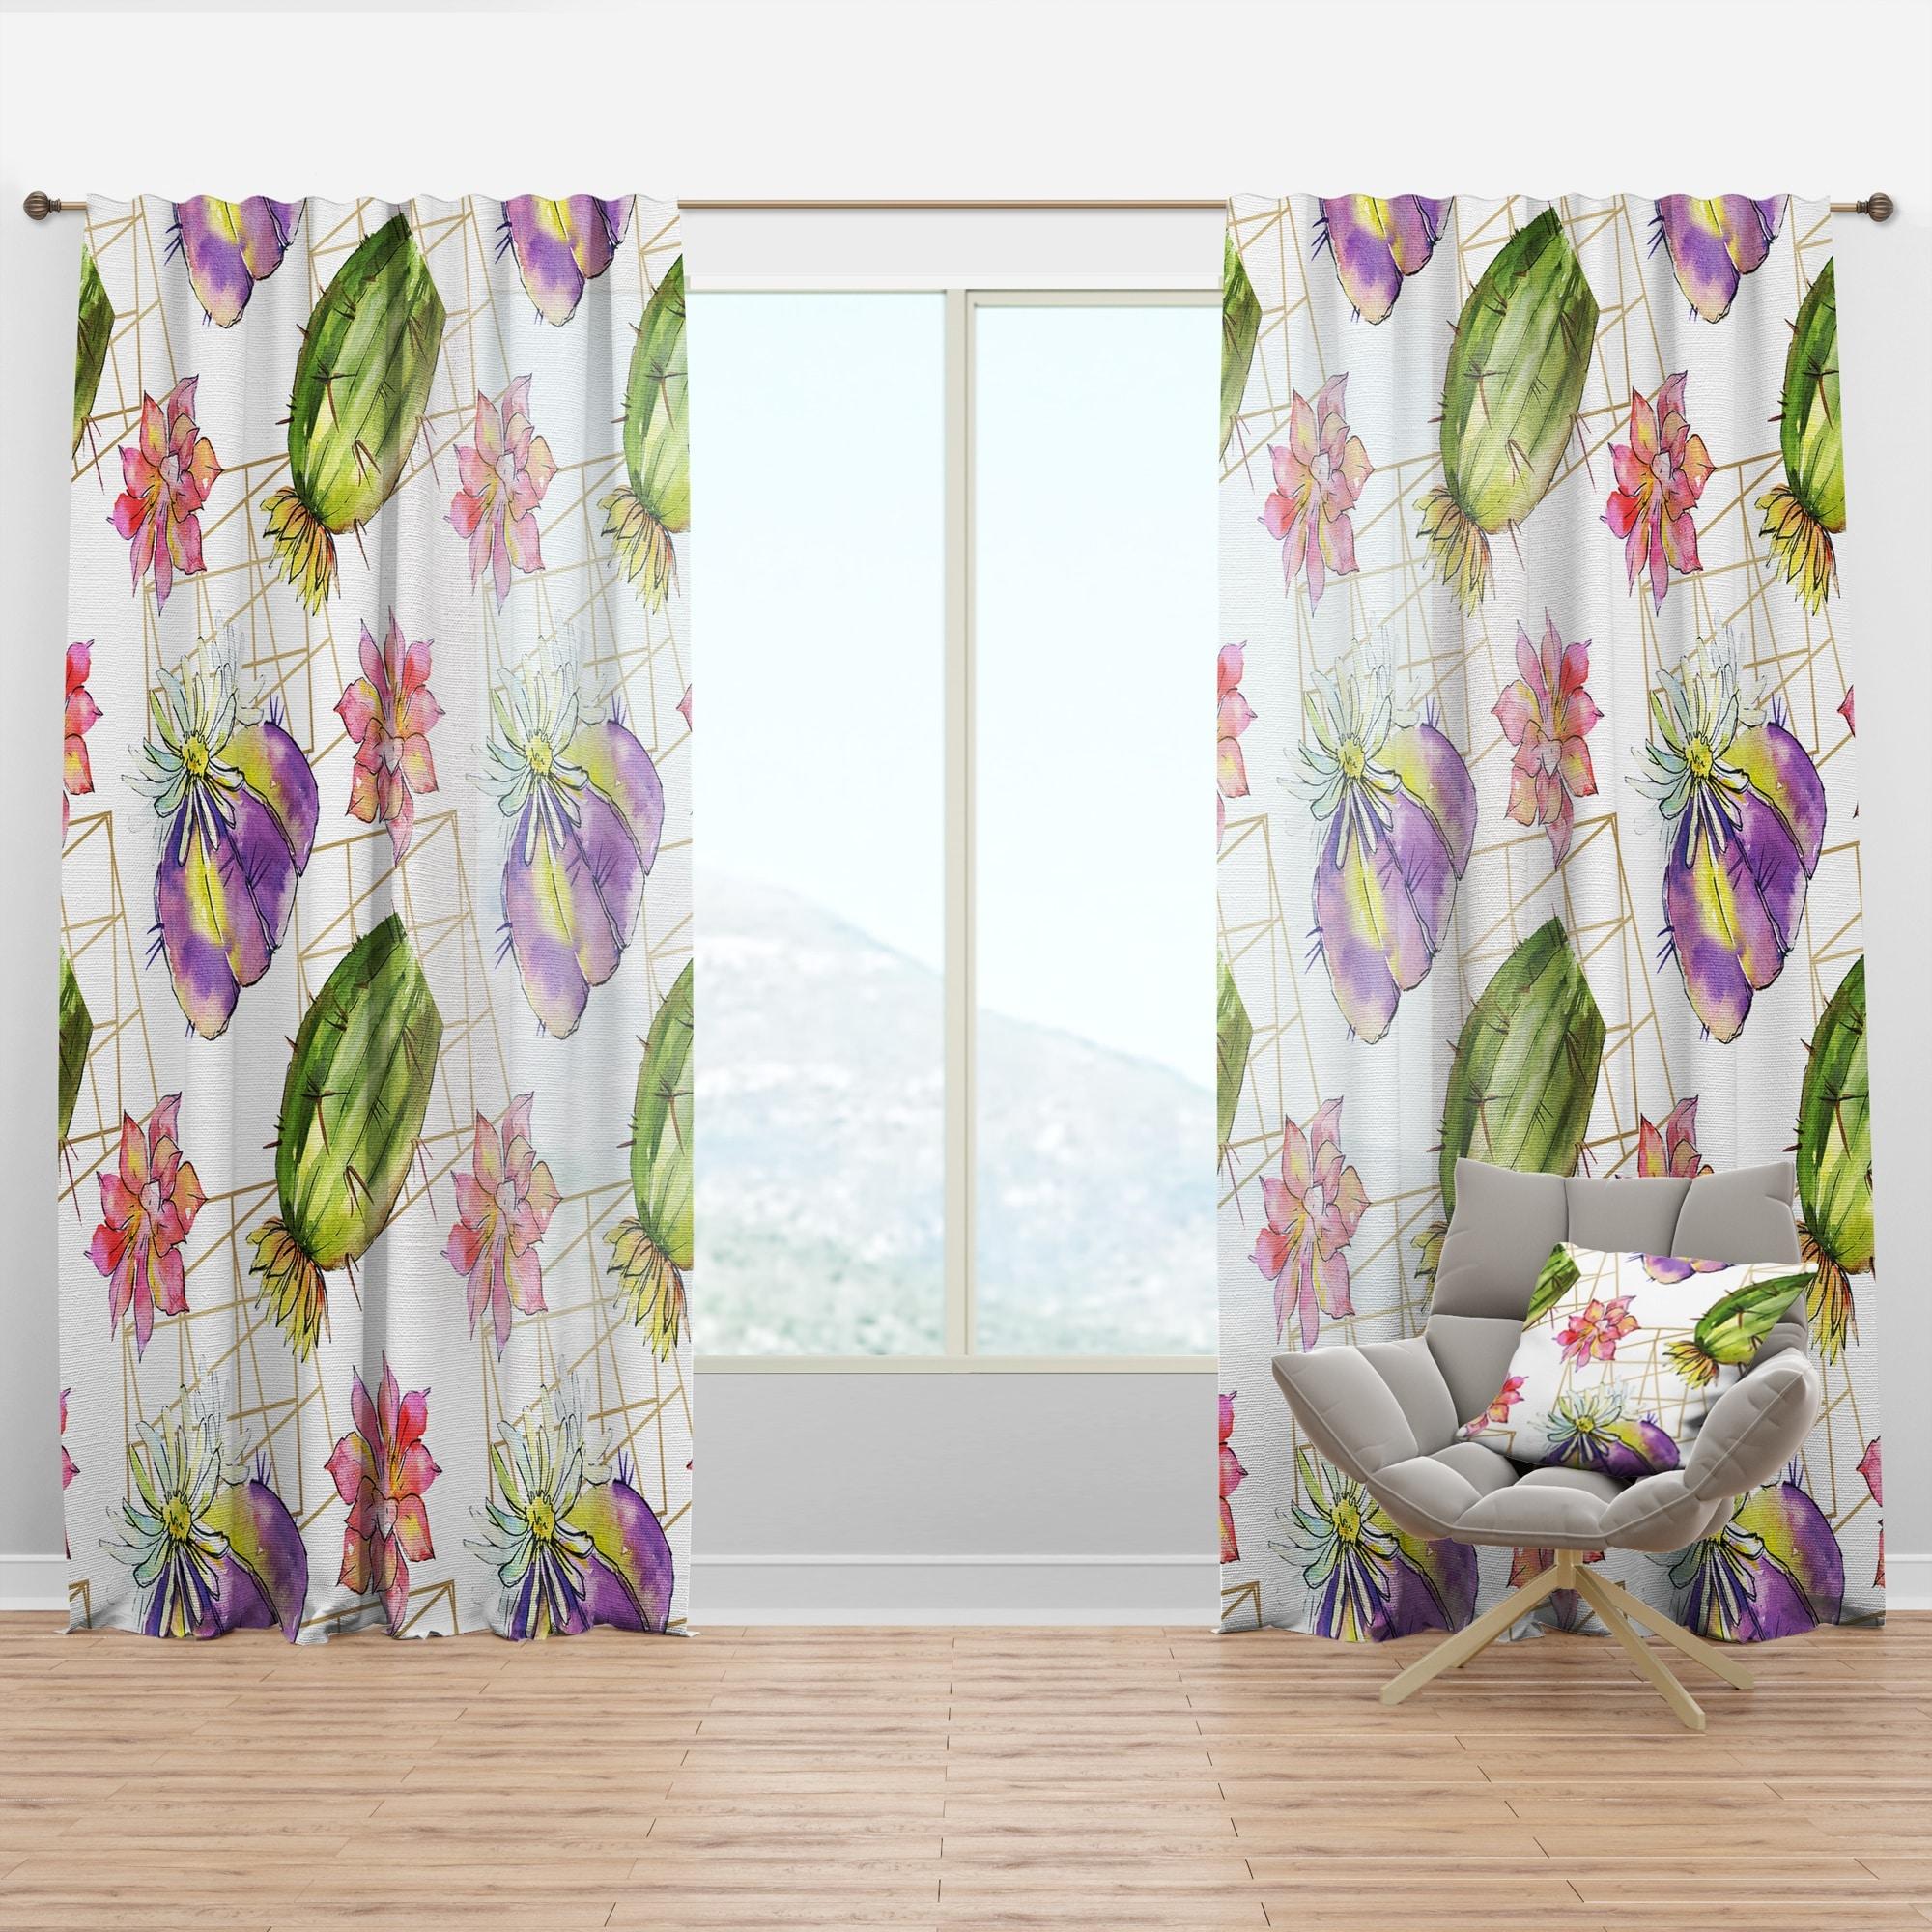 Shop Designart Green Cactus Pattern Mid Century Modern Curtain Panel Overstock 29625935